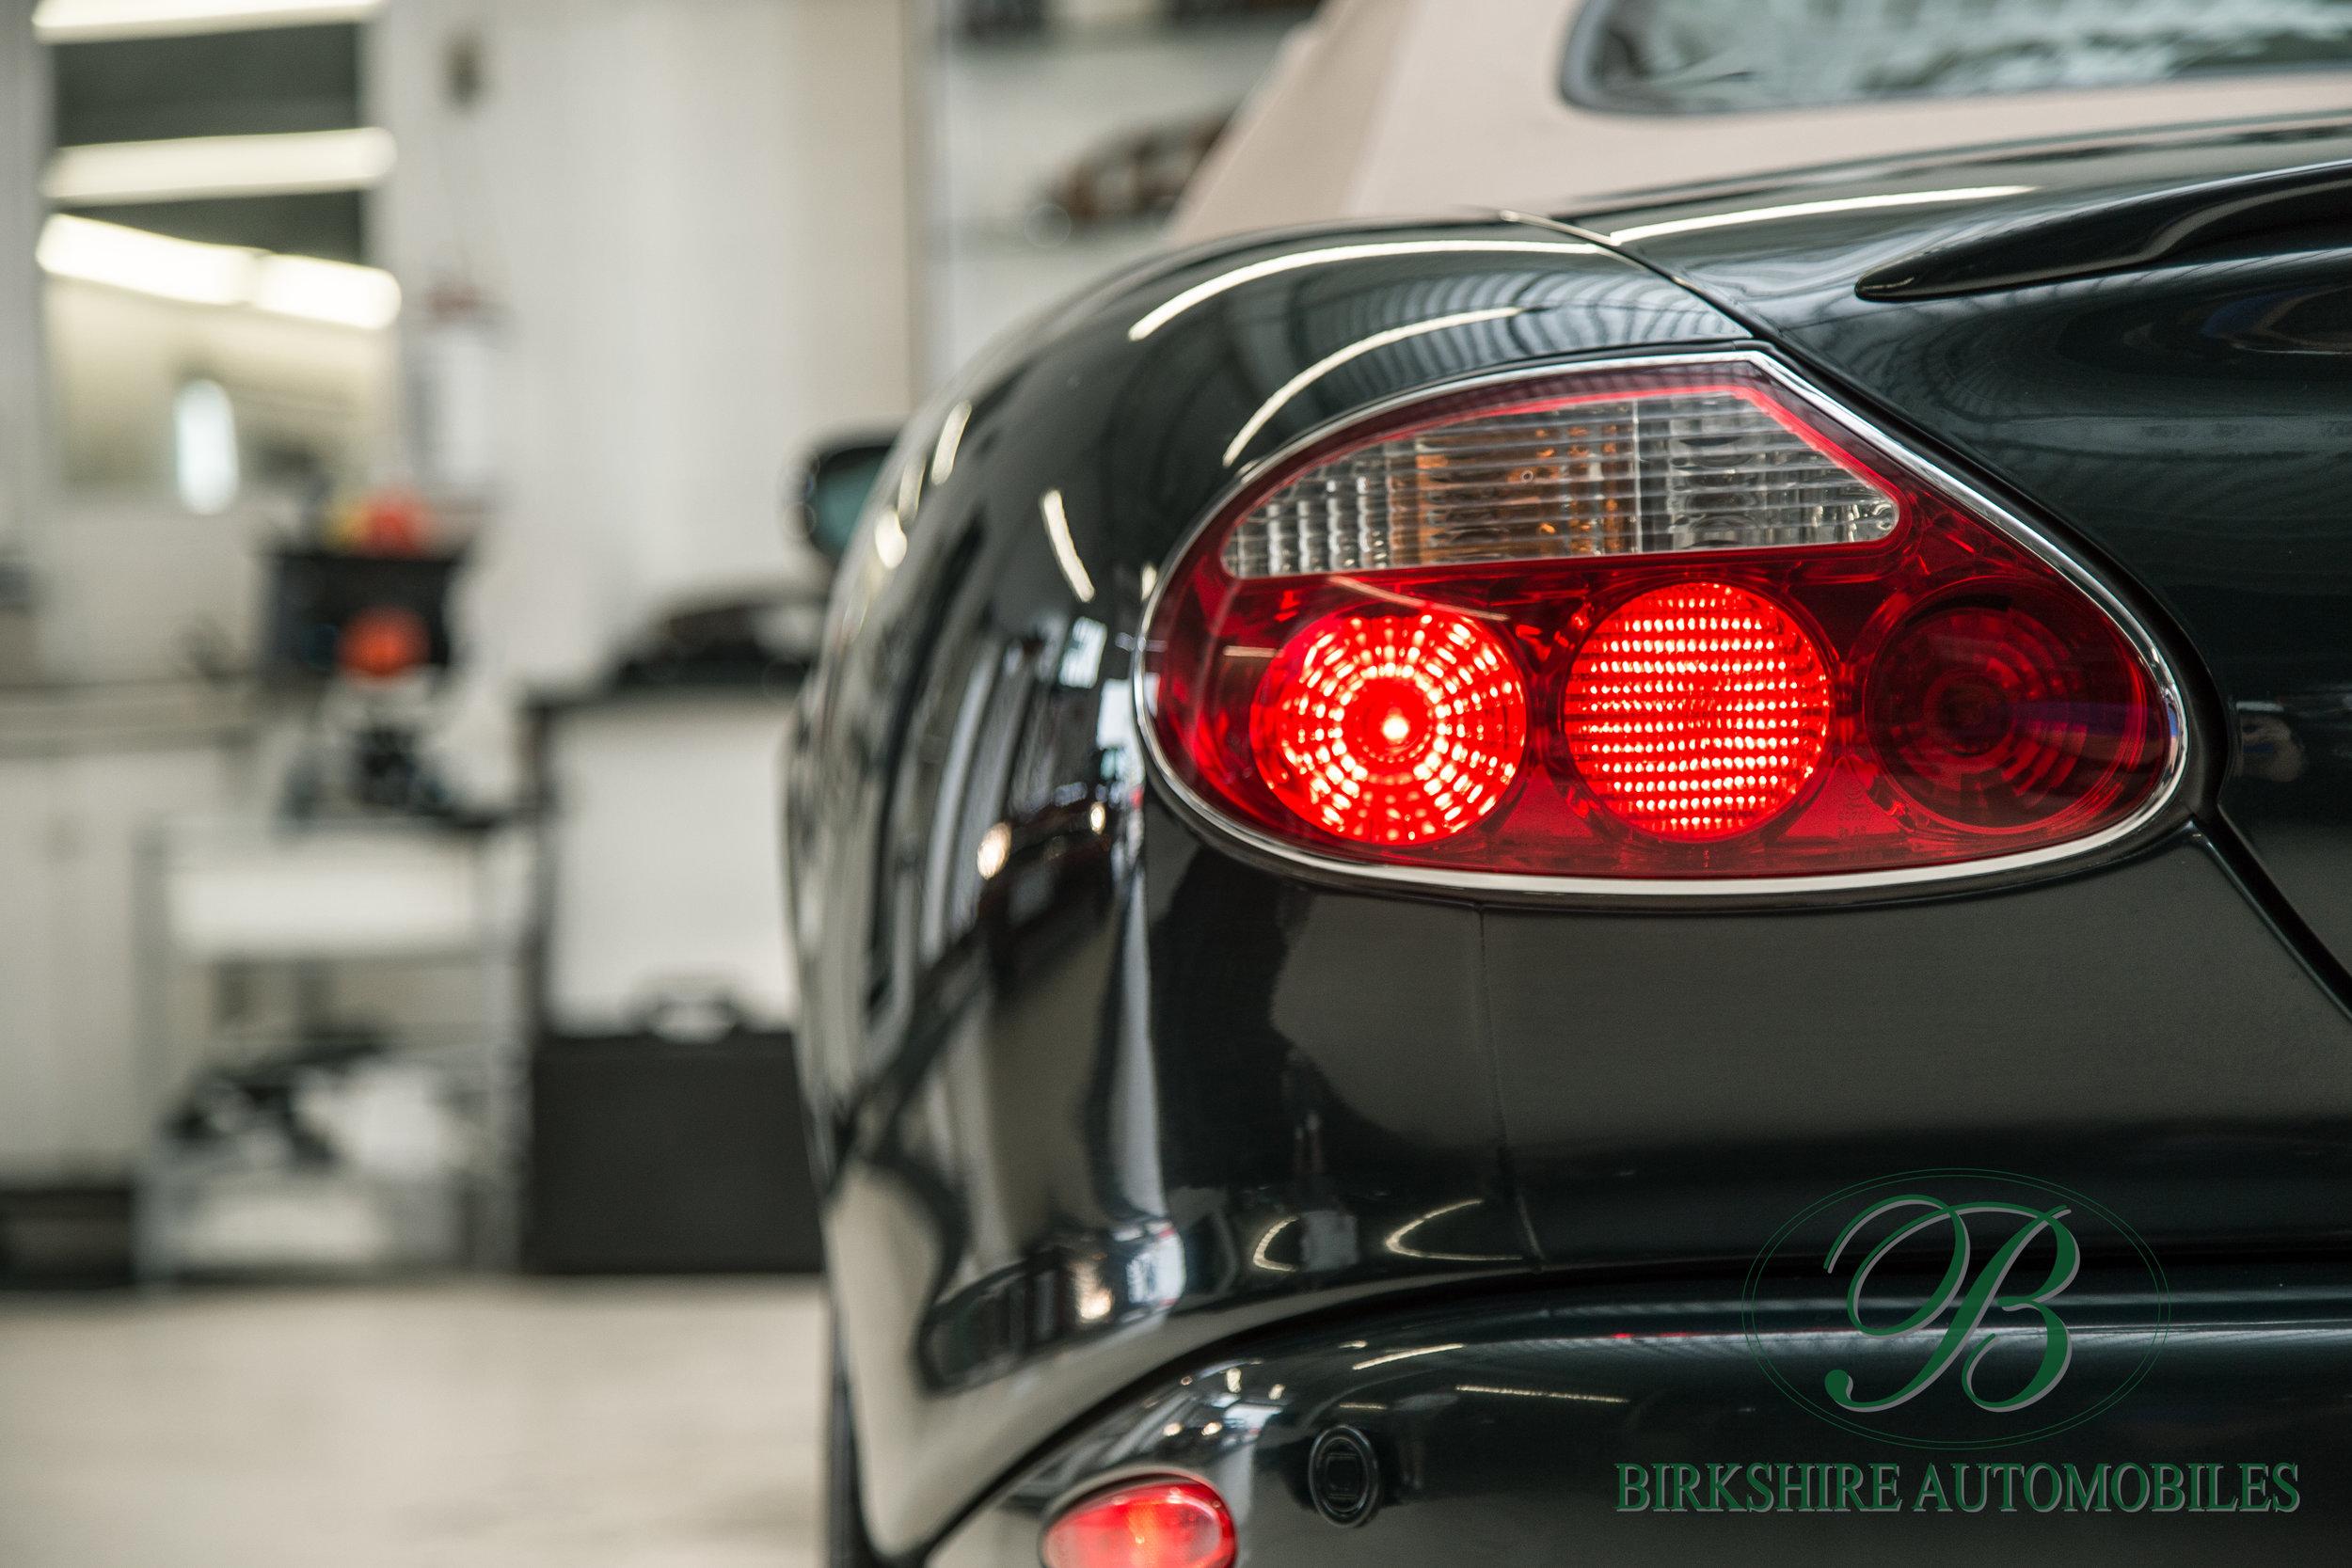 Birkshire Automobiles-2001 Jaguar XKR Convertible (8).jpg